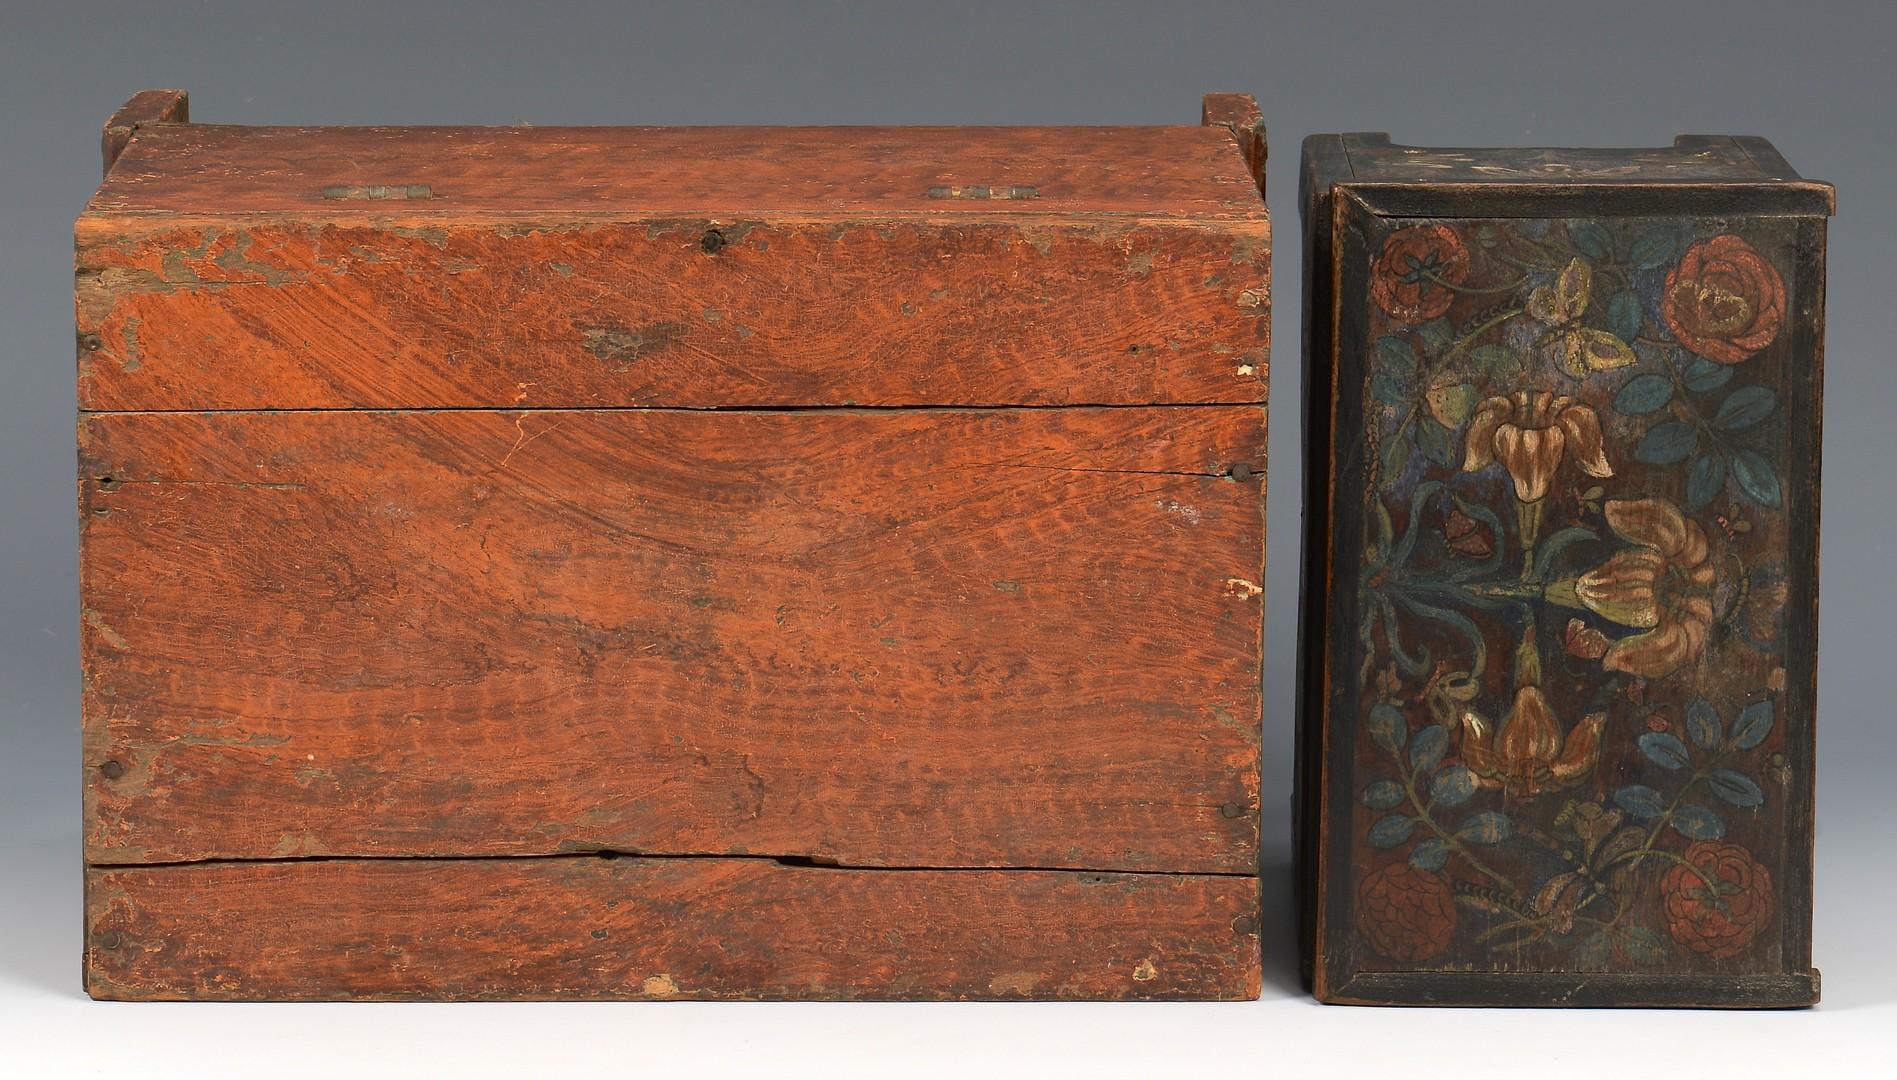 Lot 528: 2 Painted Miniature Boxes, incl. 1 Grain Painted